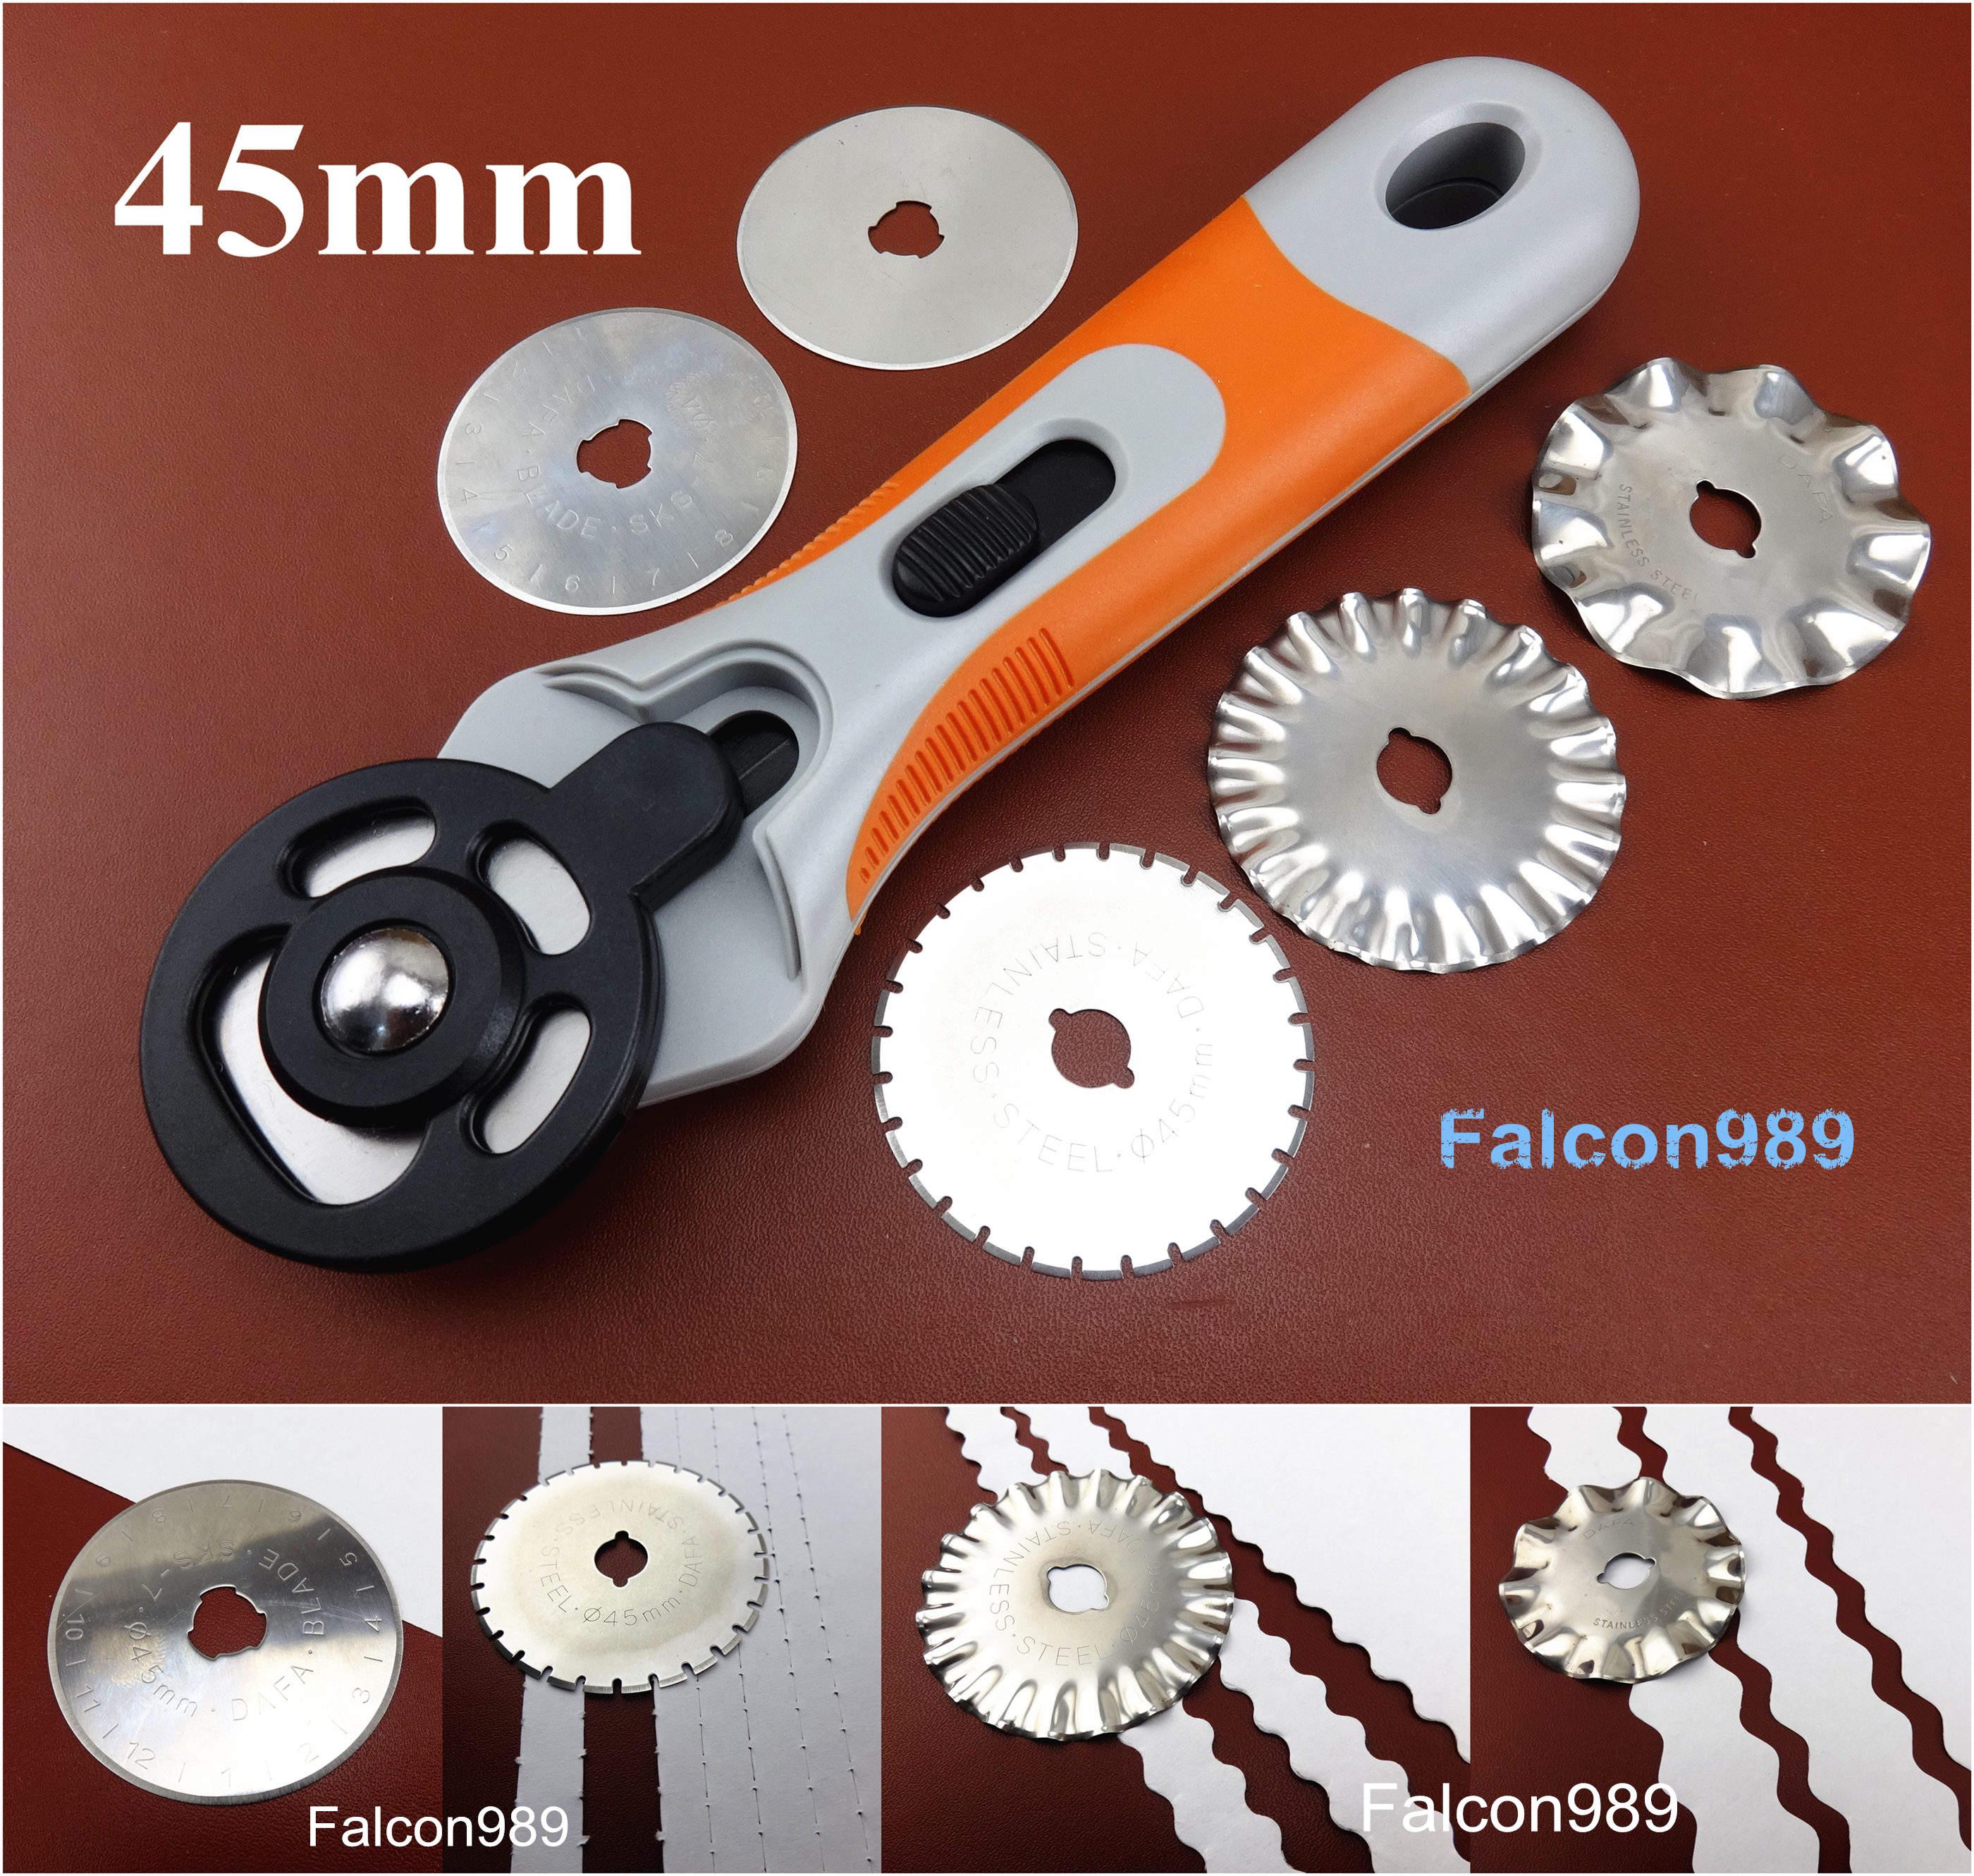 Rotary Cutter /& Circle Compass Cutter A4 Cutting Mat Leather Craft Tool Set Kit